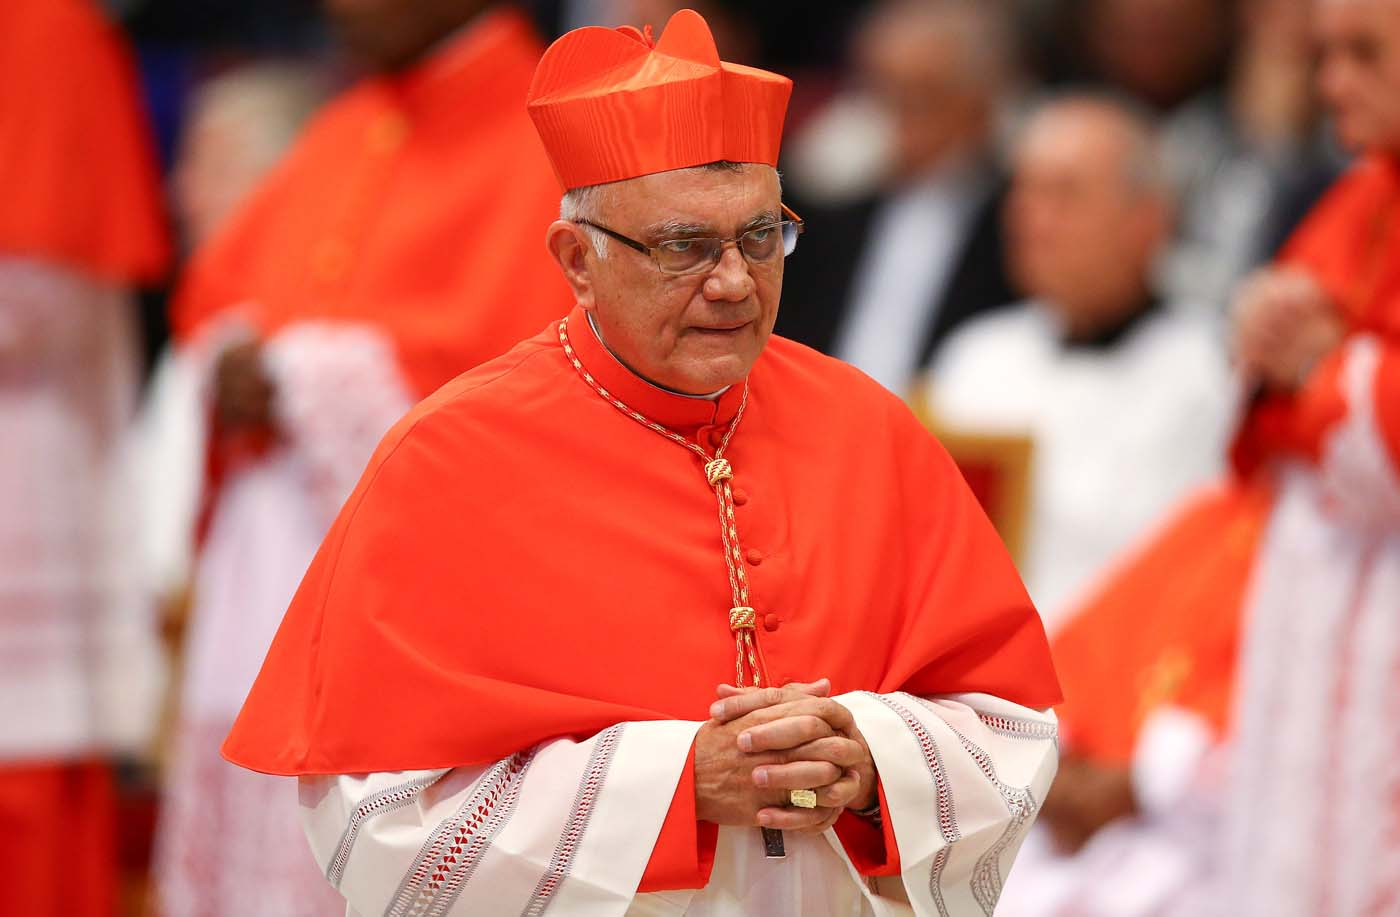 Designan al cardenal Porras miembro de la Pontificia Comisión para América Latina